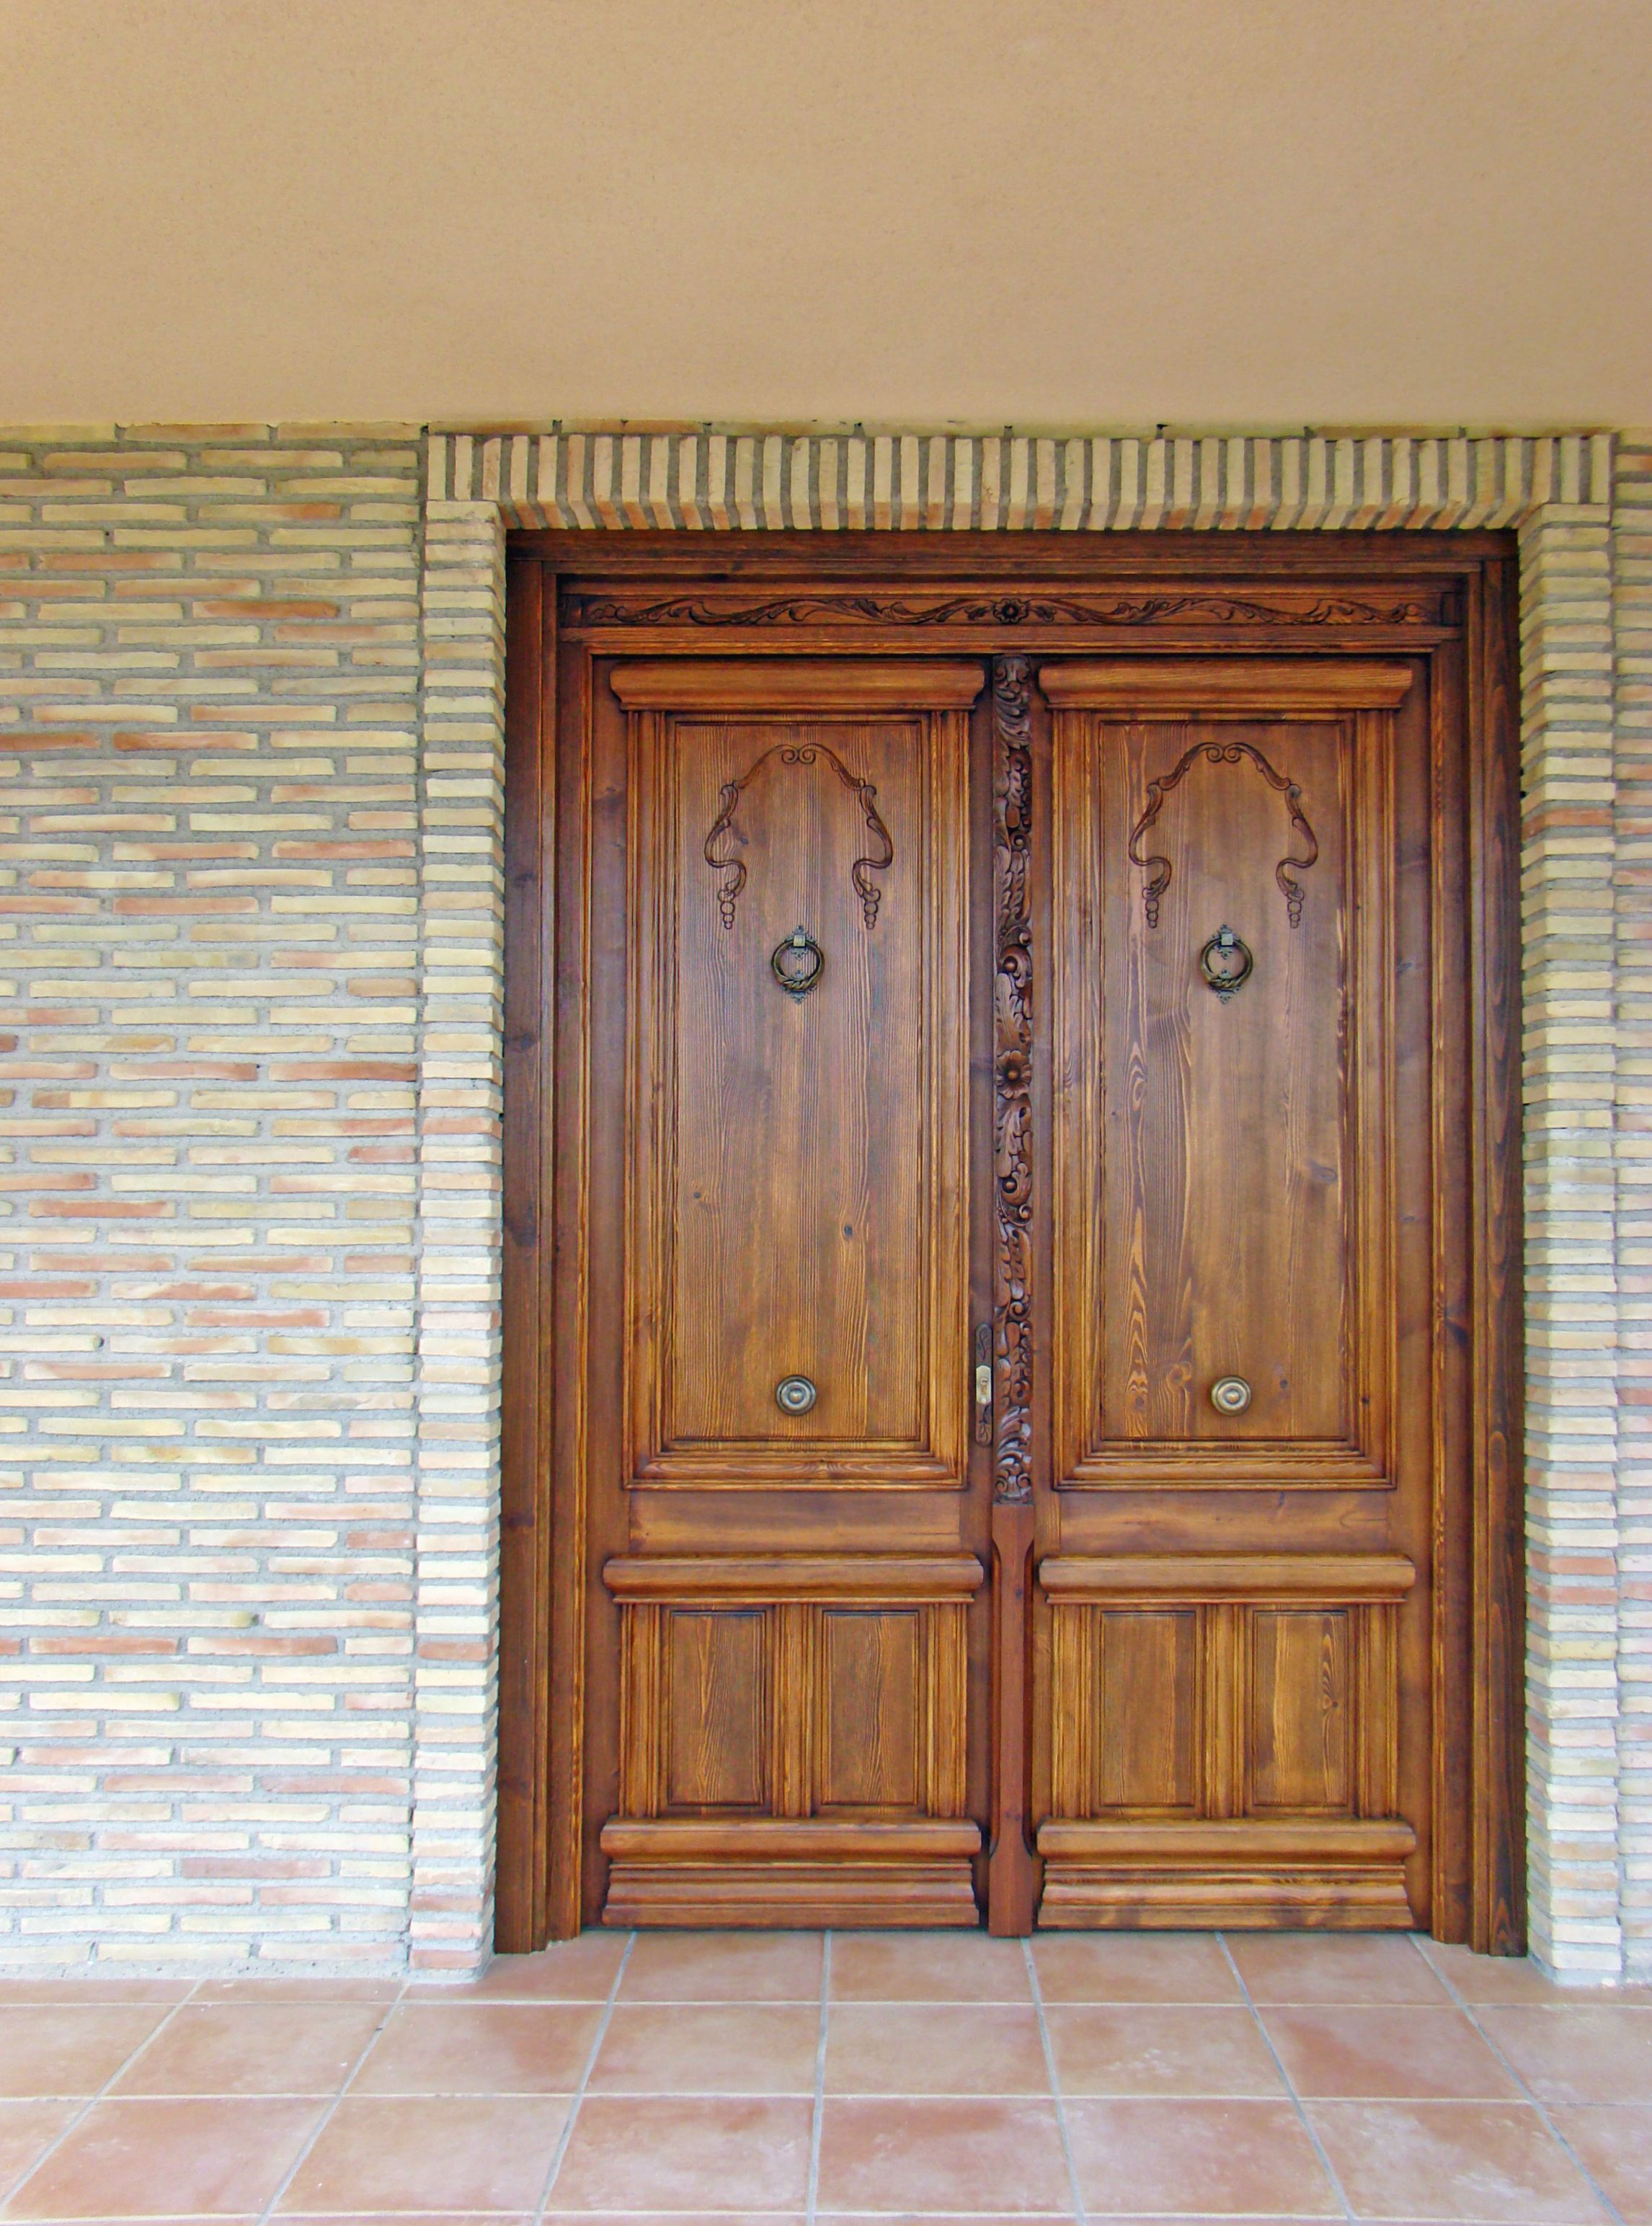 Puerta Palacete Puertas De Madera Ventanas De Madera De Madera